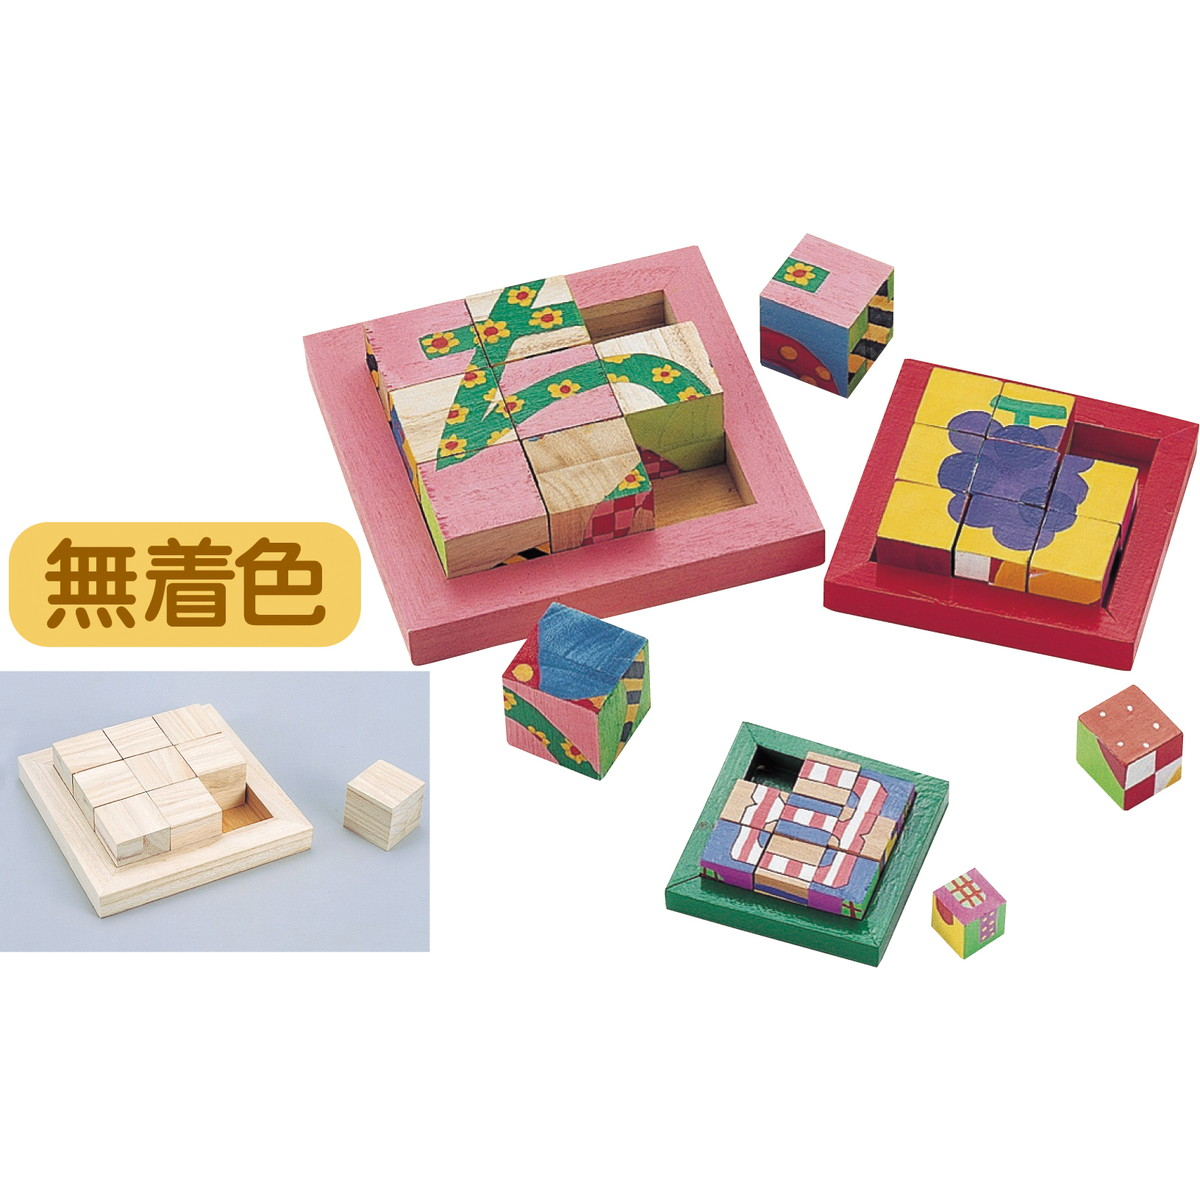 Artec アーテック キュービックパズル #55700 メーカー在庫限り品 小 開店記念セール